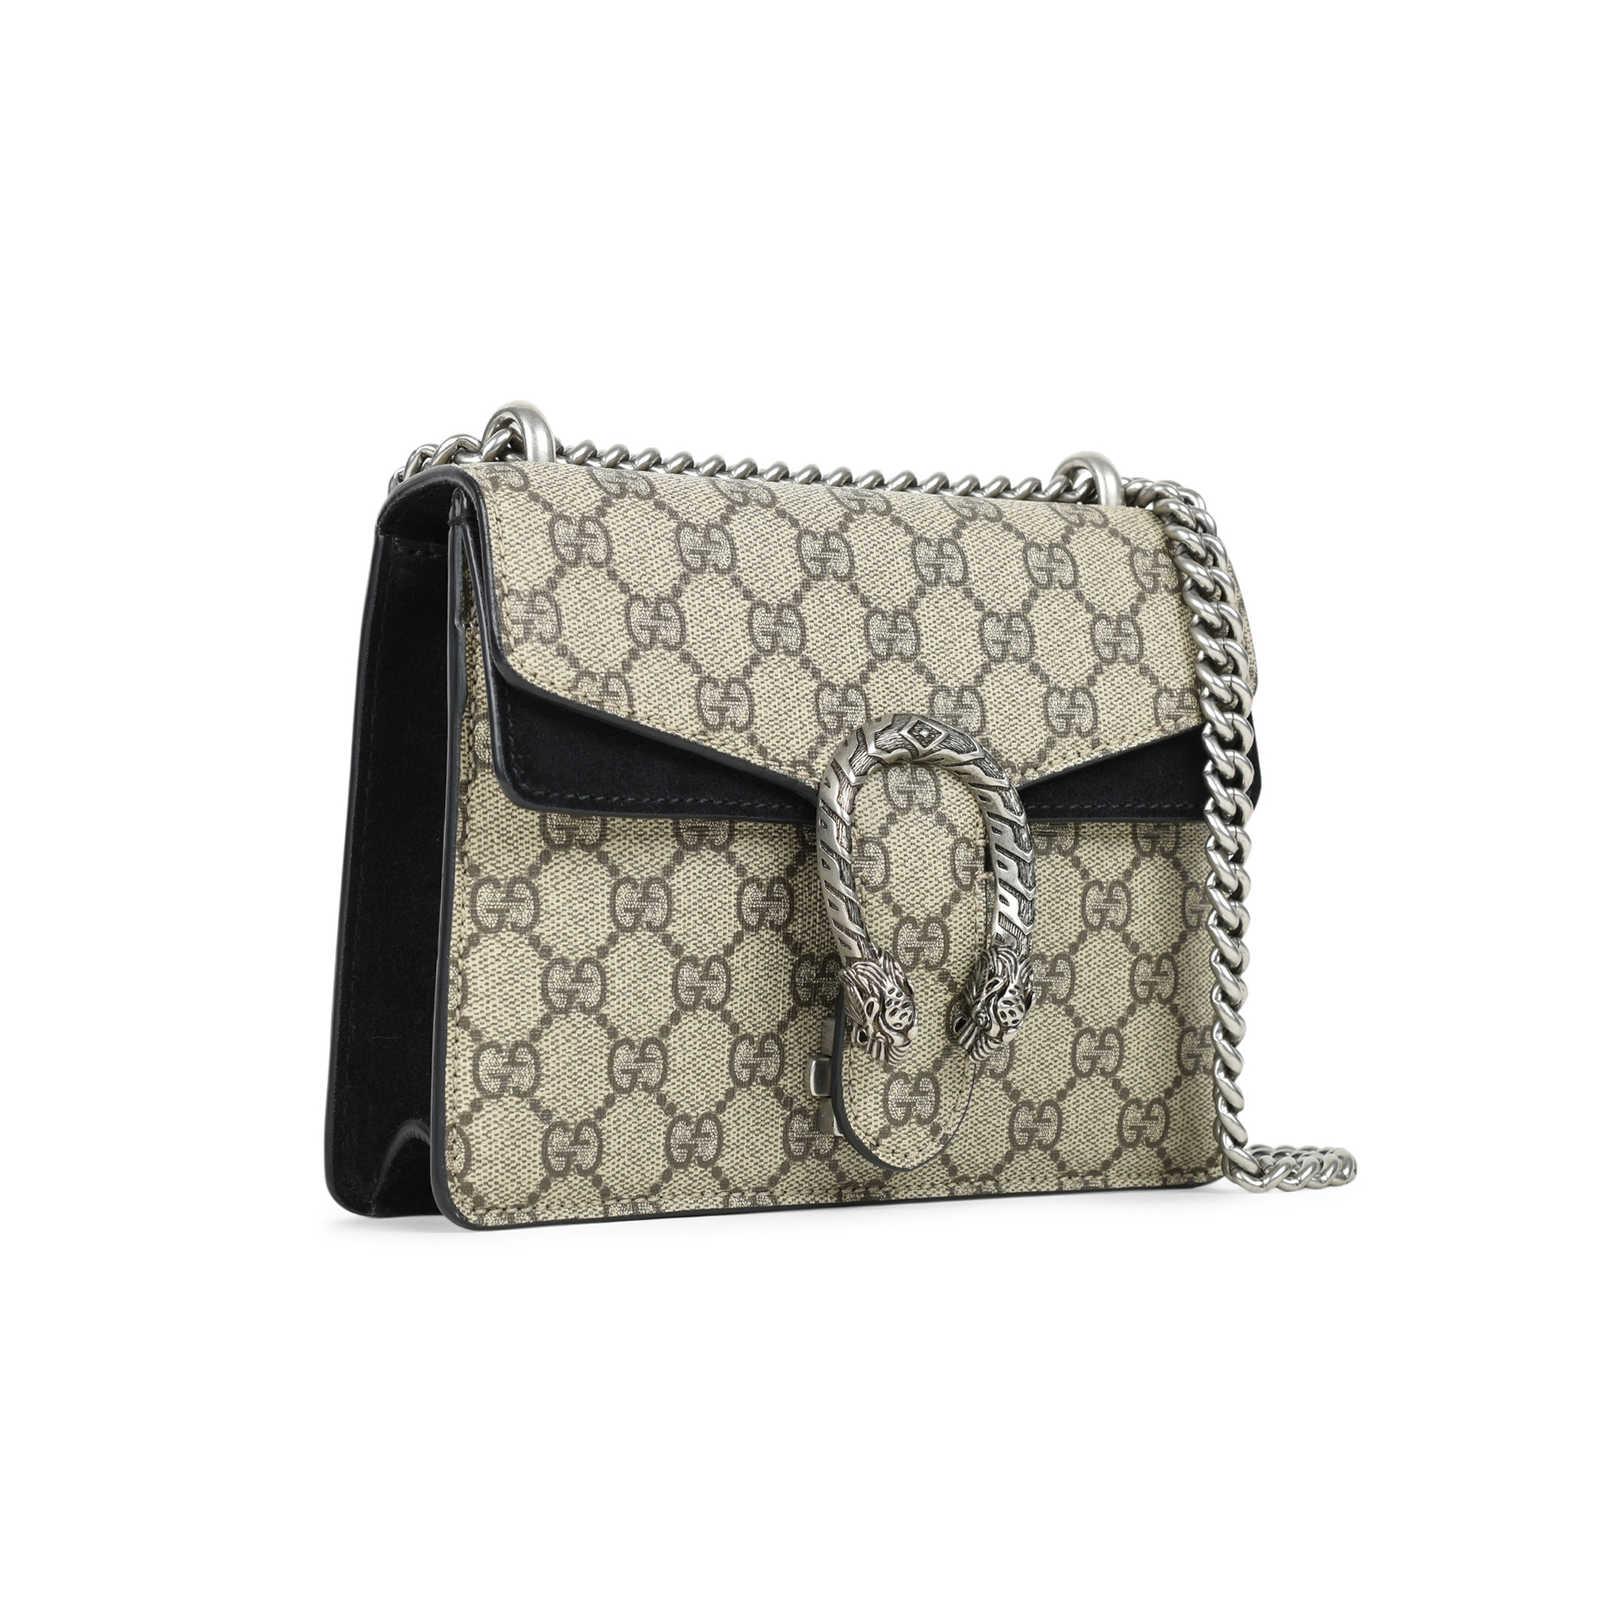 14b04b26a ... Authentic Second Hand Gucci Dionysus Monogram GG Supreme Mini Bag  (PSS-240-00220 ...